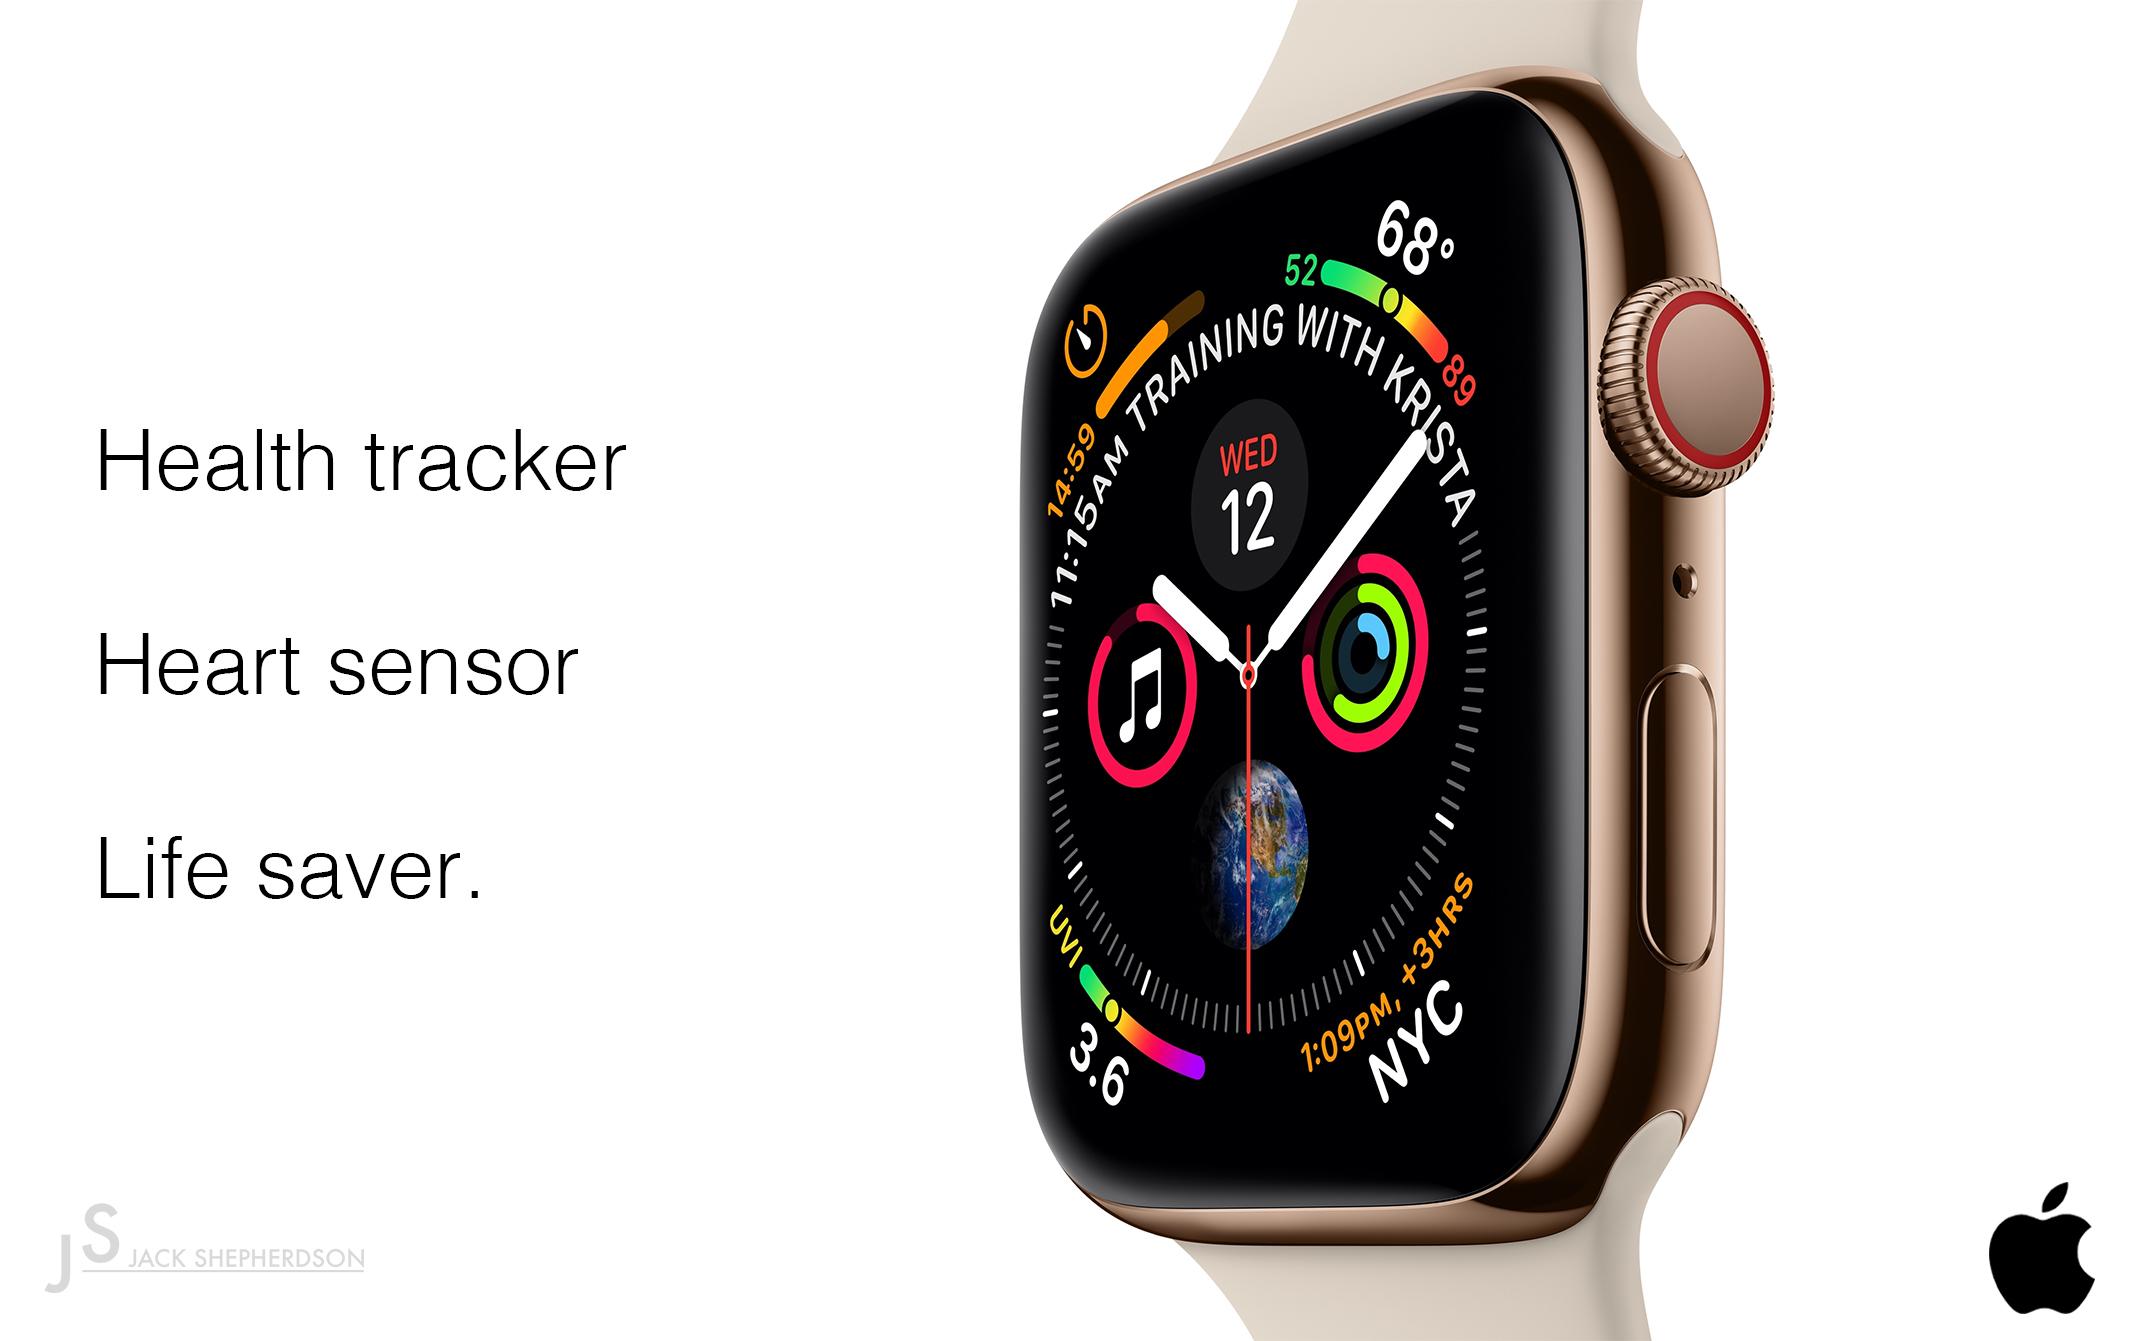 Apple Watch S4 2 Watermarked.jpg